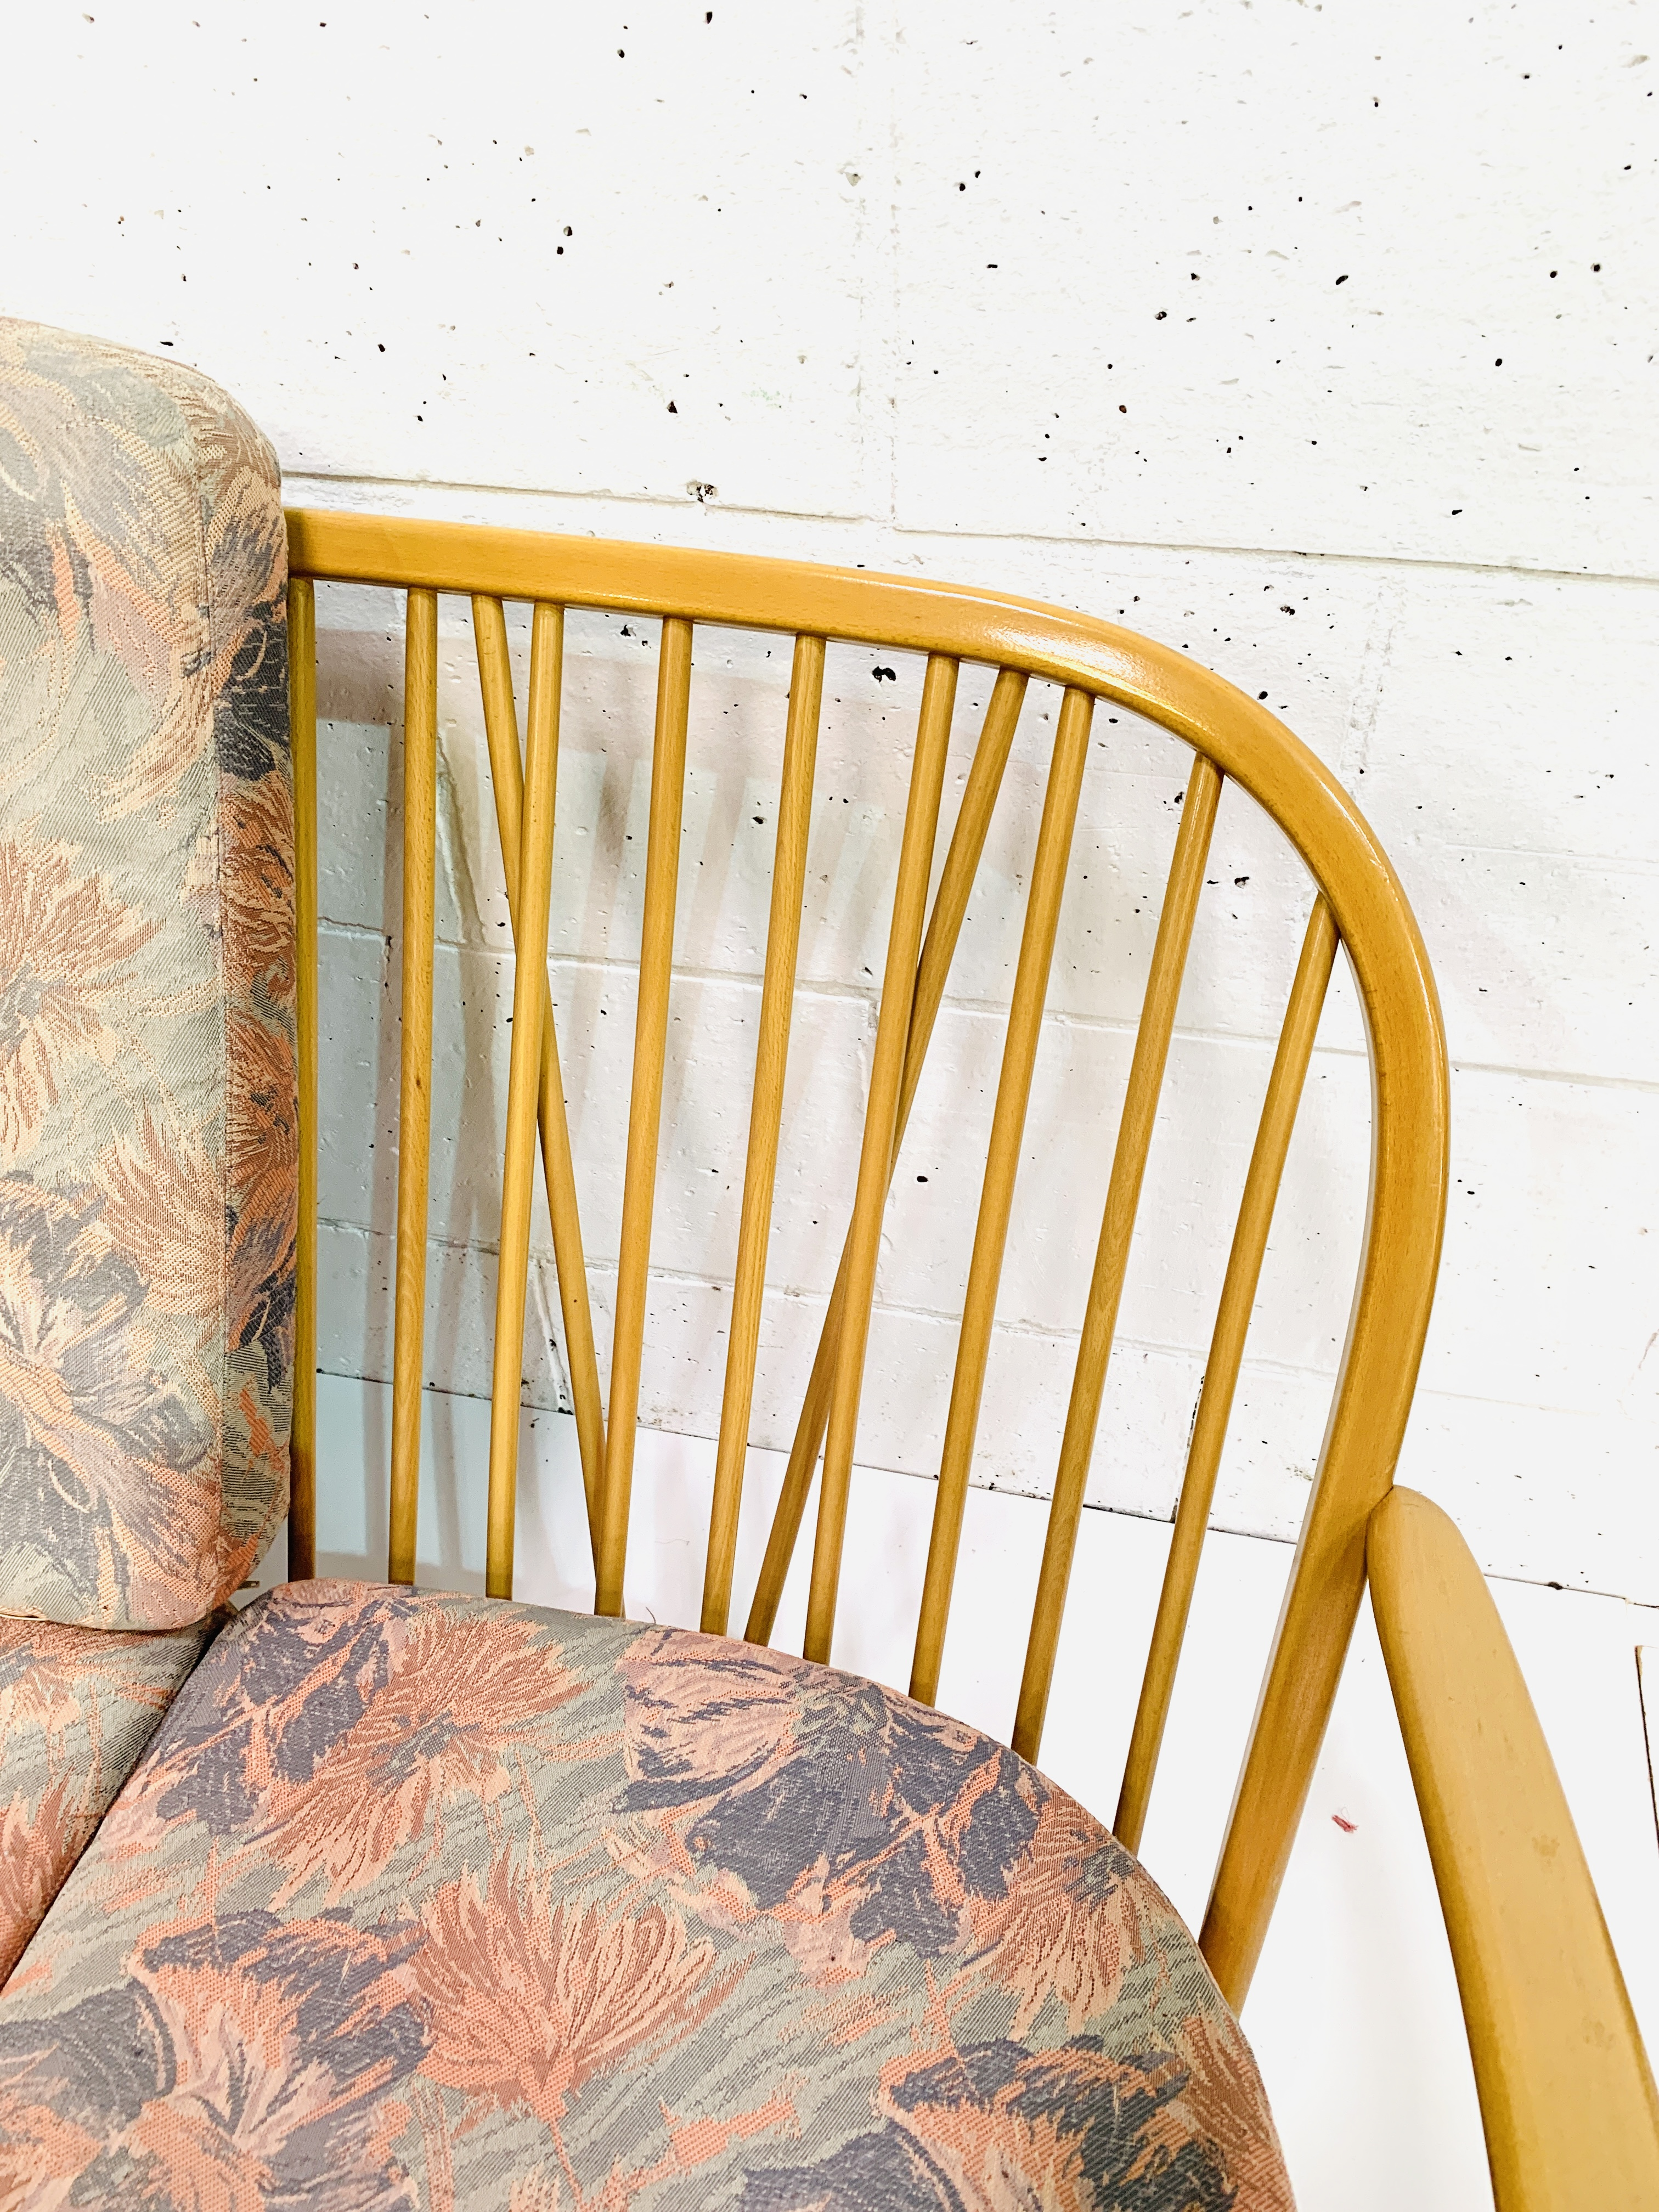 Ercol three seat sofa - Image 5 of 5